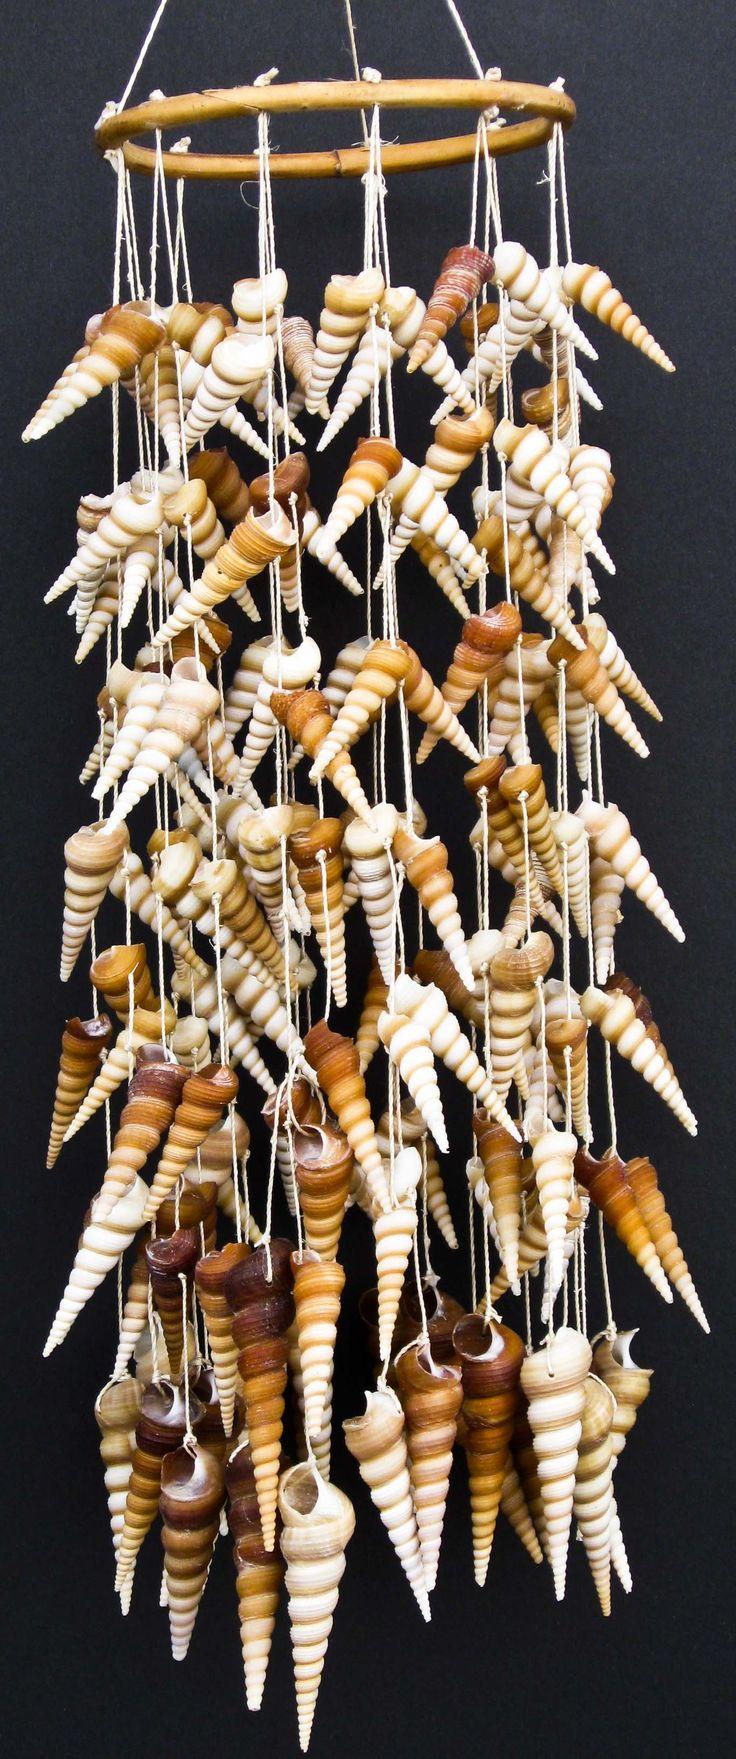 shells - caramel, cream, coral, toast, linen, slate background